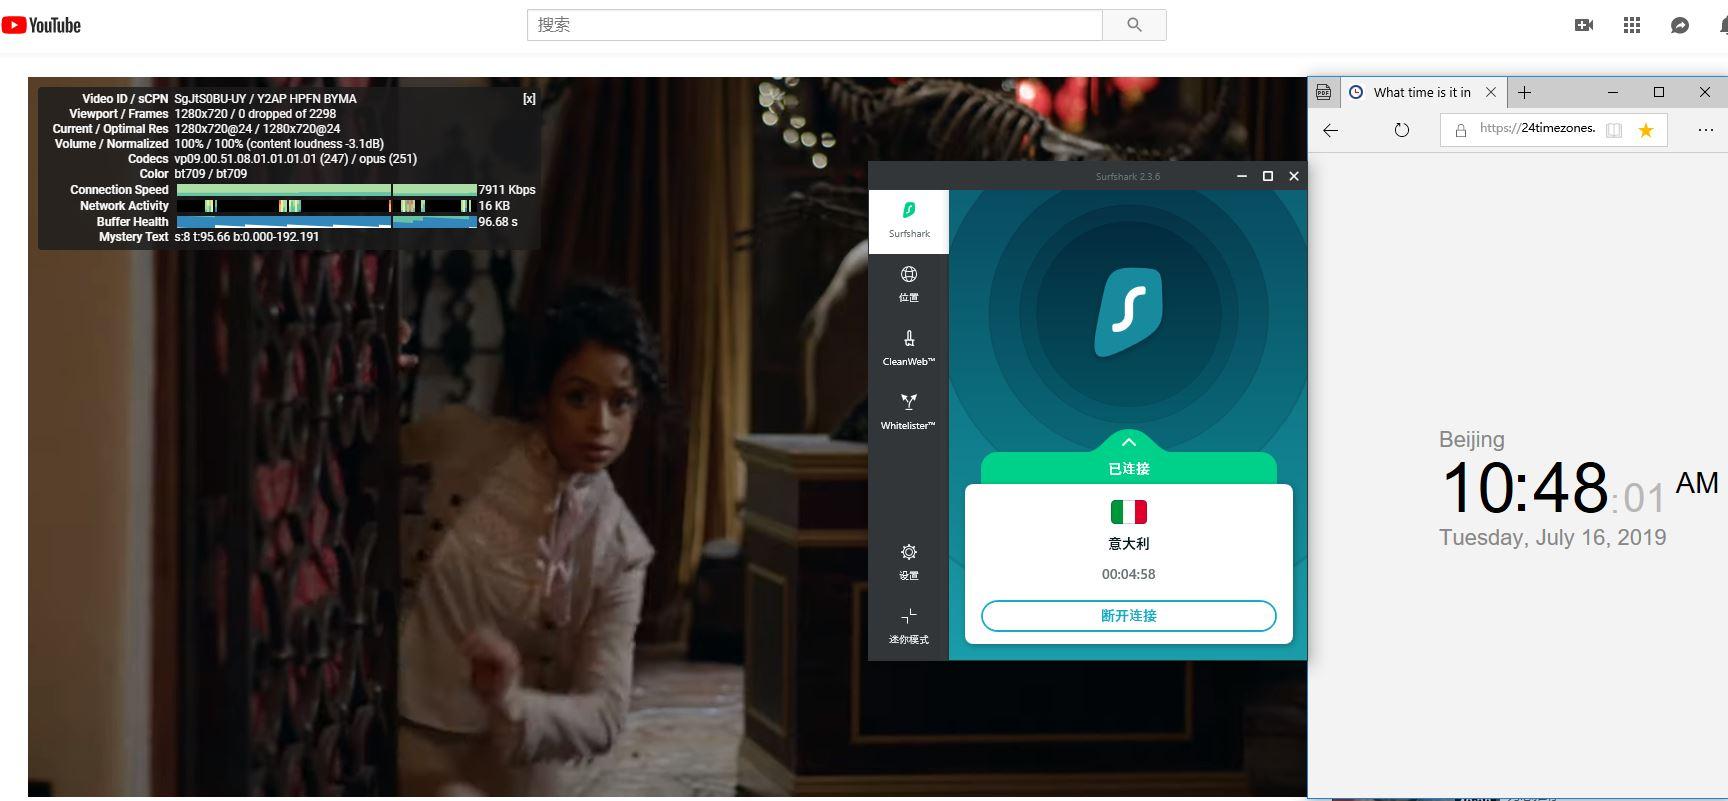 windows surfsharkVPN 意大利的服务器节点 中国翻墙-科学上网 YouTube测试-20190716